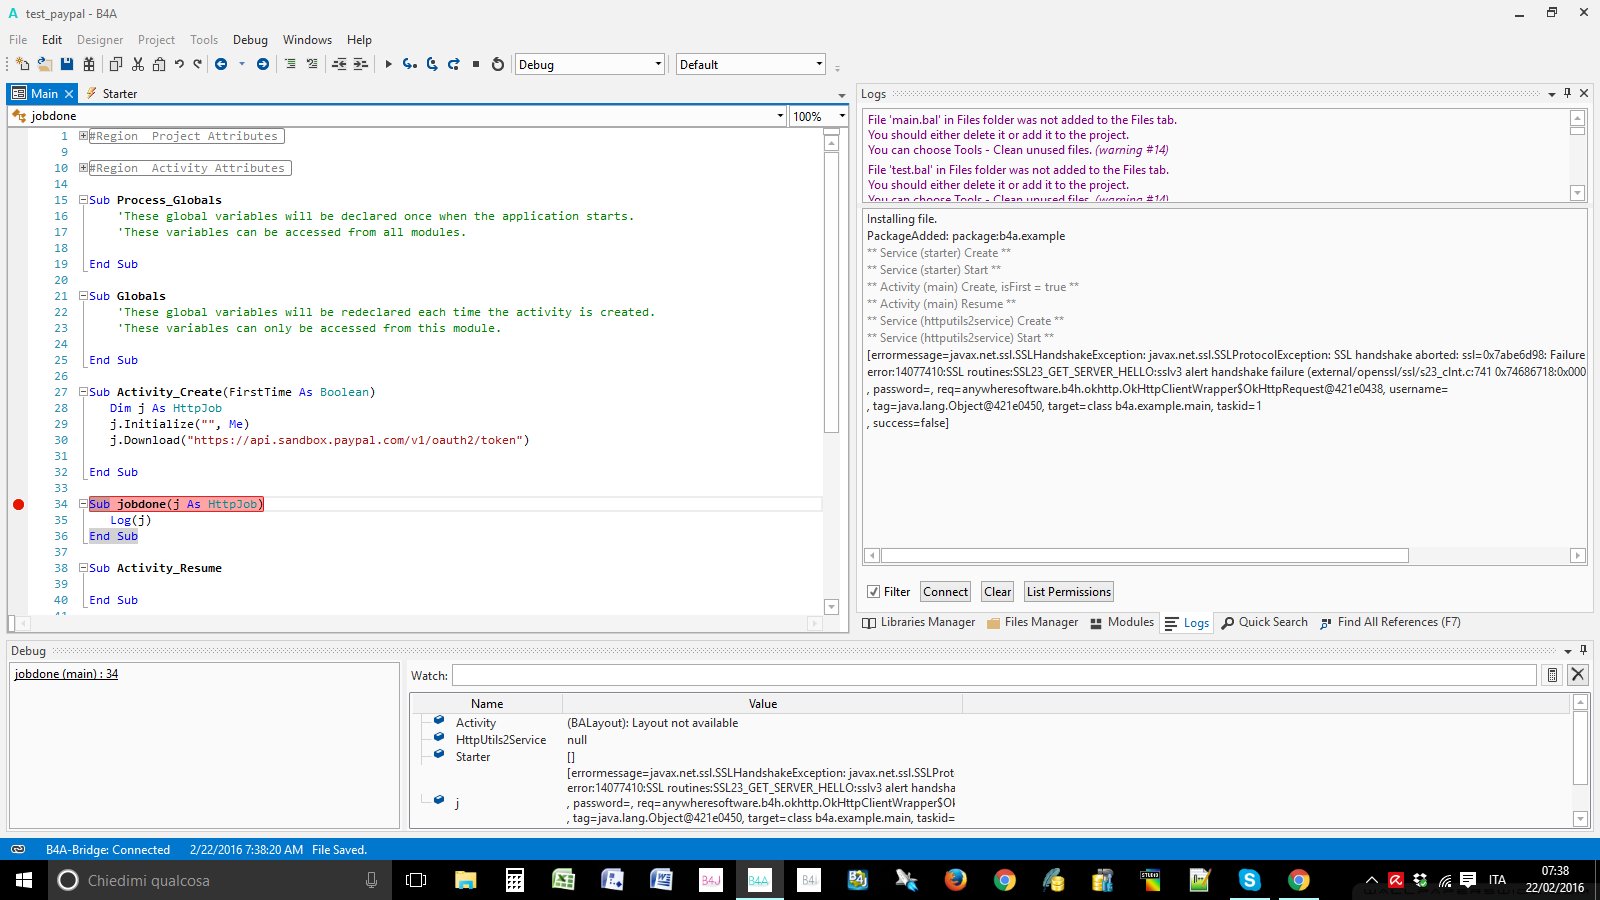 Android Question - okHttp - javax net ssl SSLProtocolException SHA